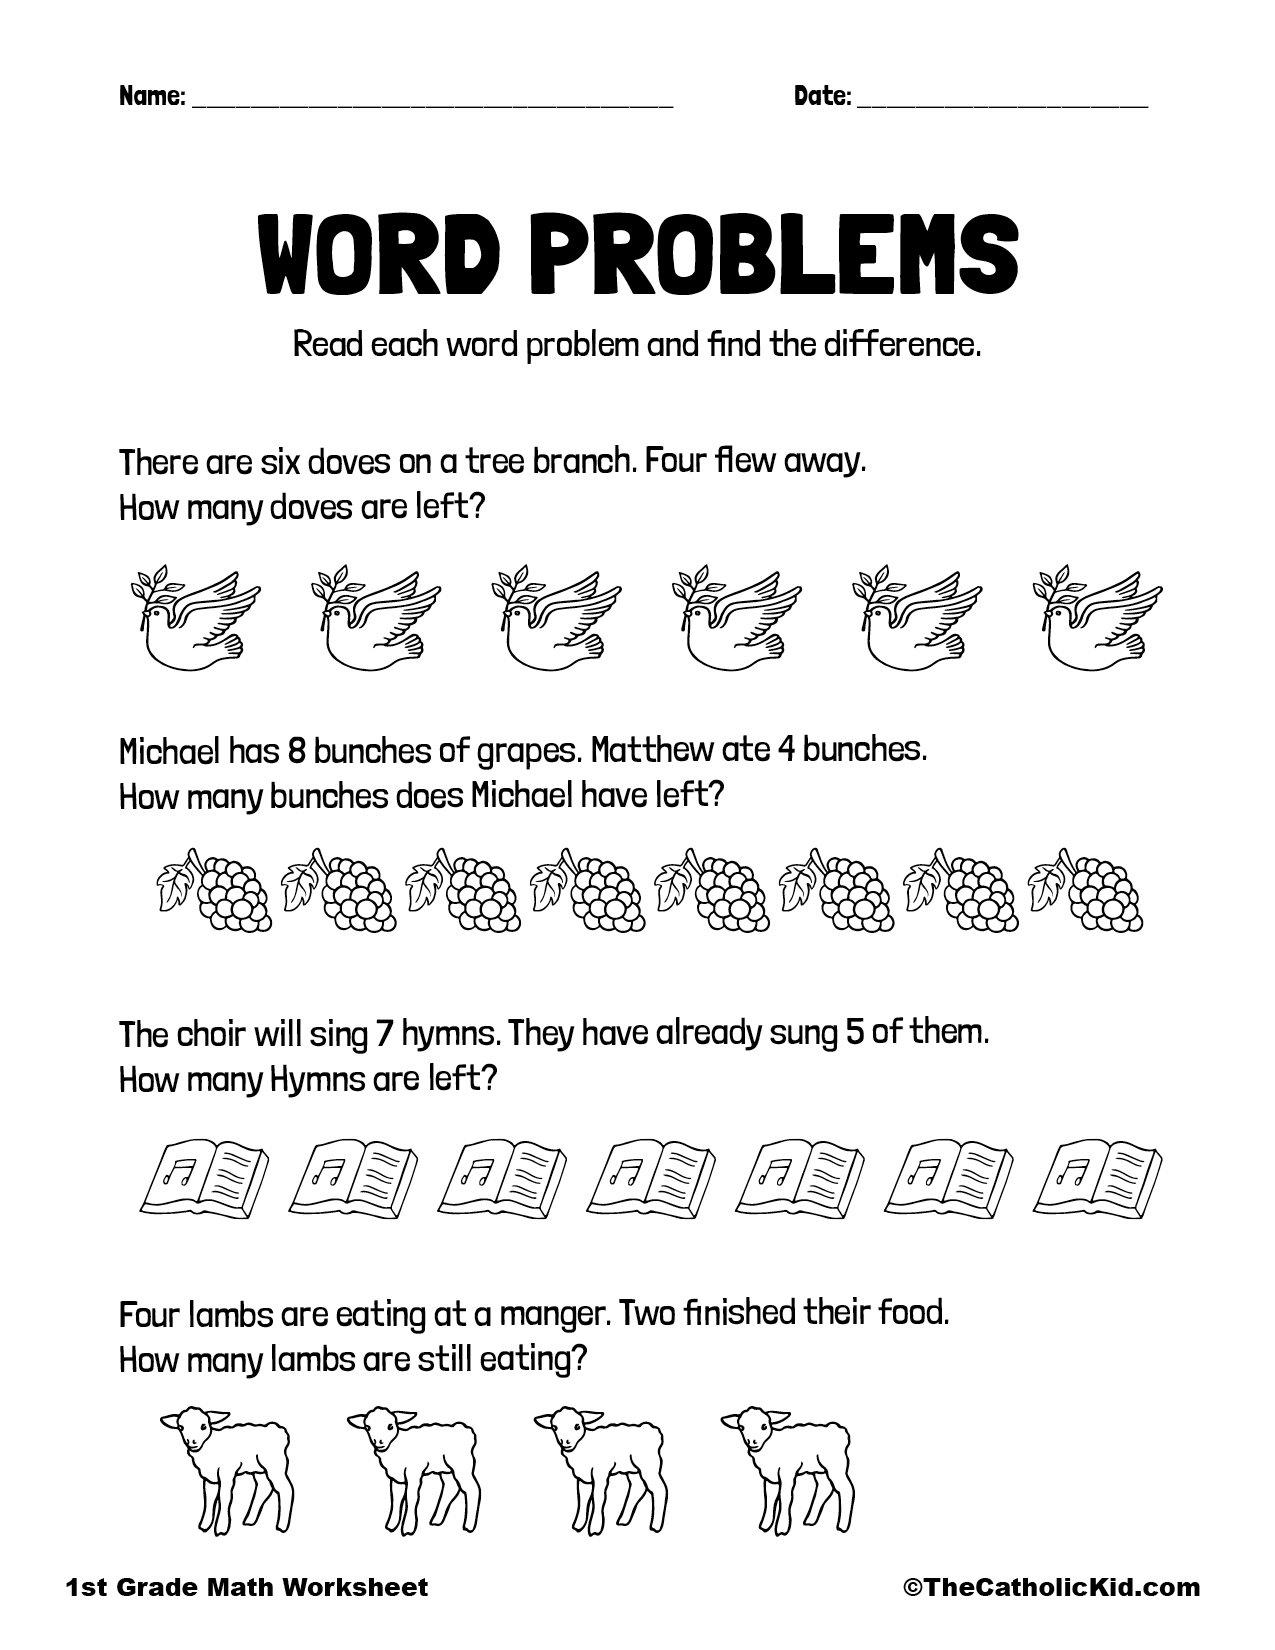 Math Word Problems - 1st Grade Math Worksheet Catholic